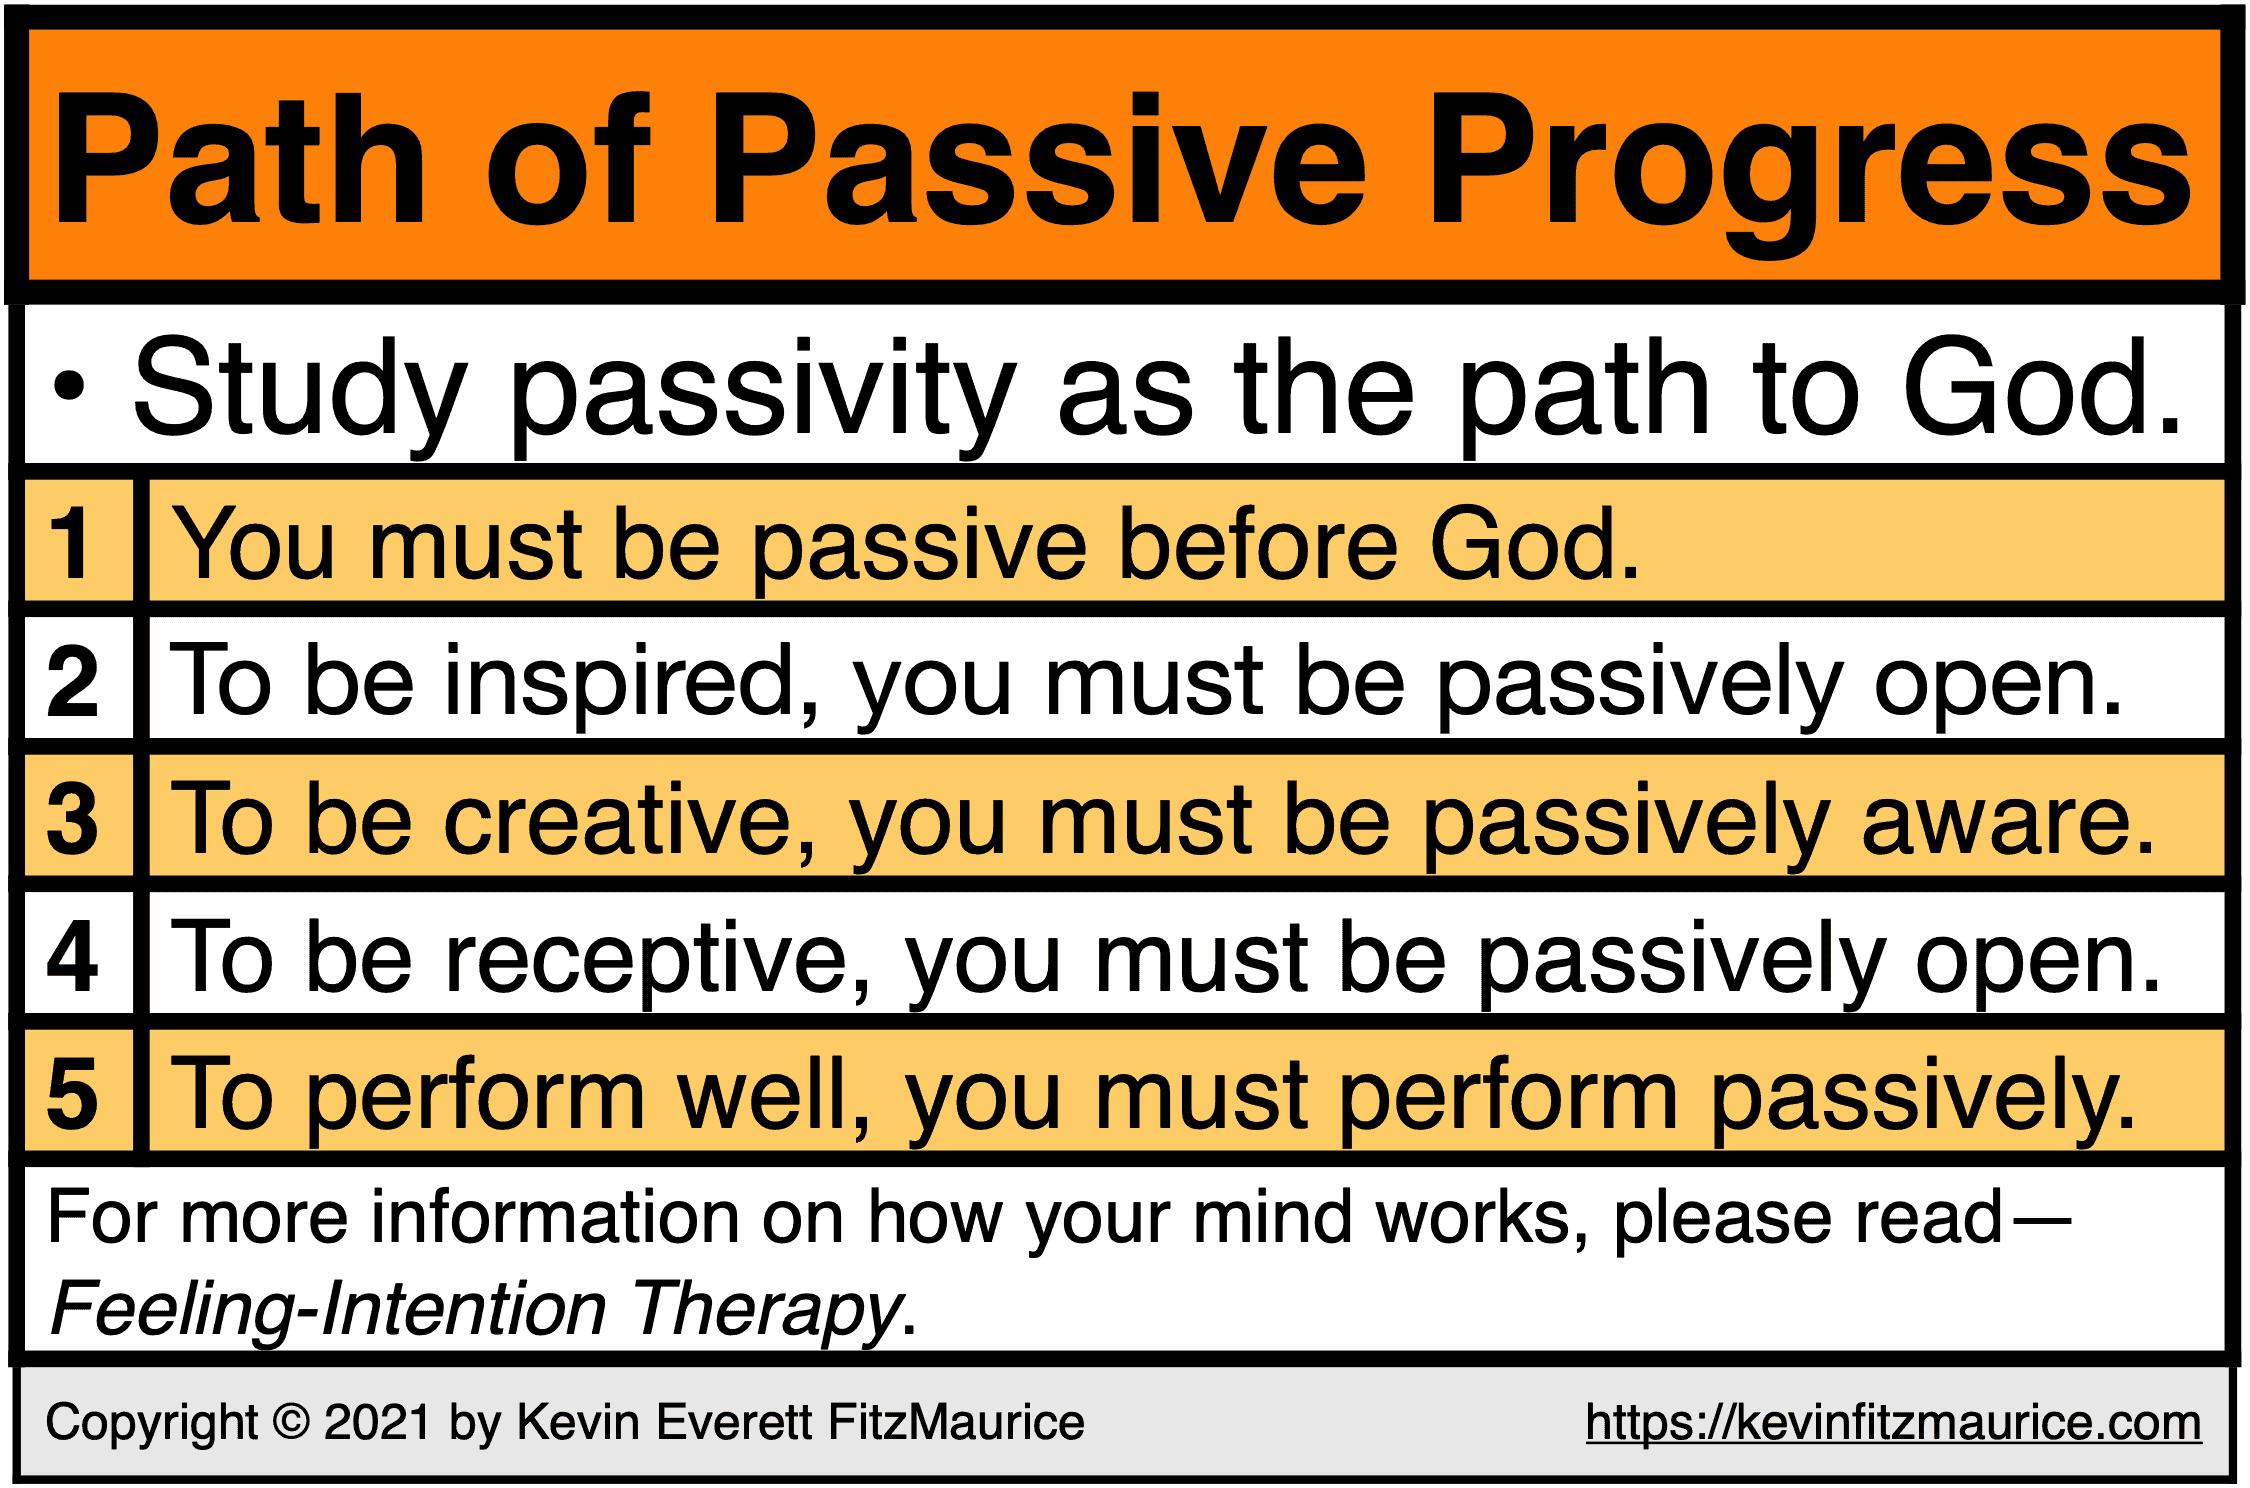 The Path of Passive Progress